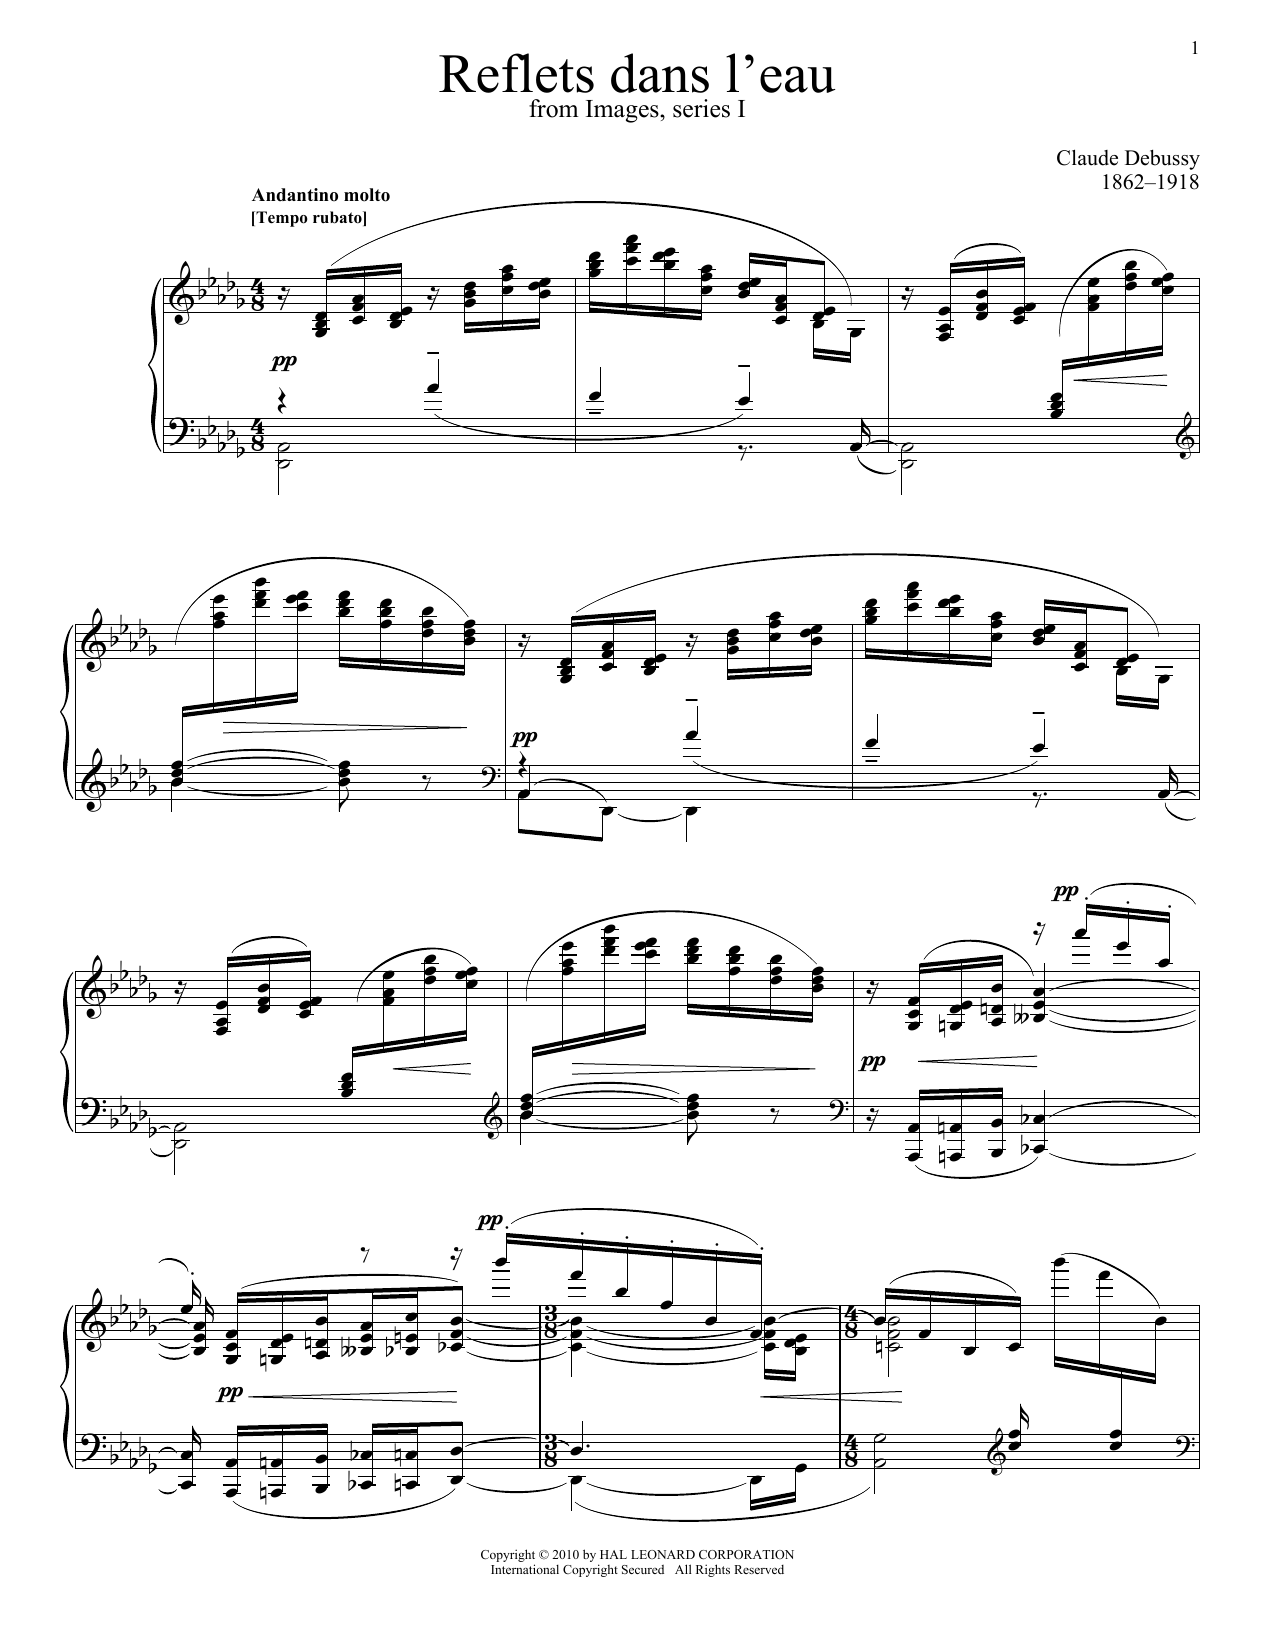 Claude Debussy Reflets Dans L'eau sheet music notes and chords